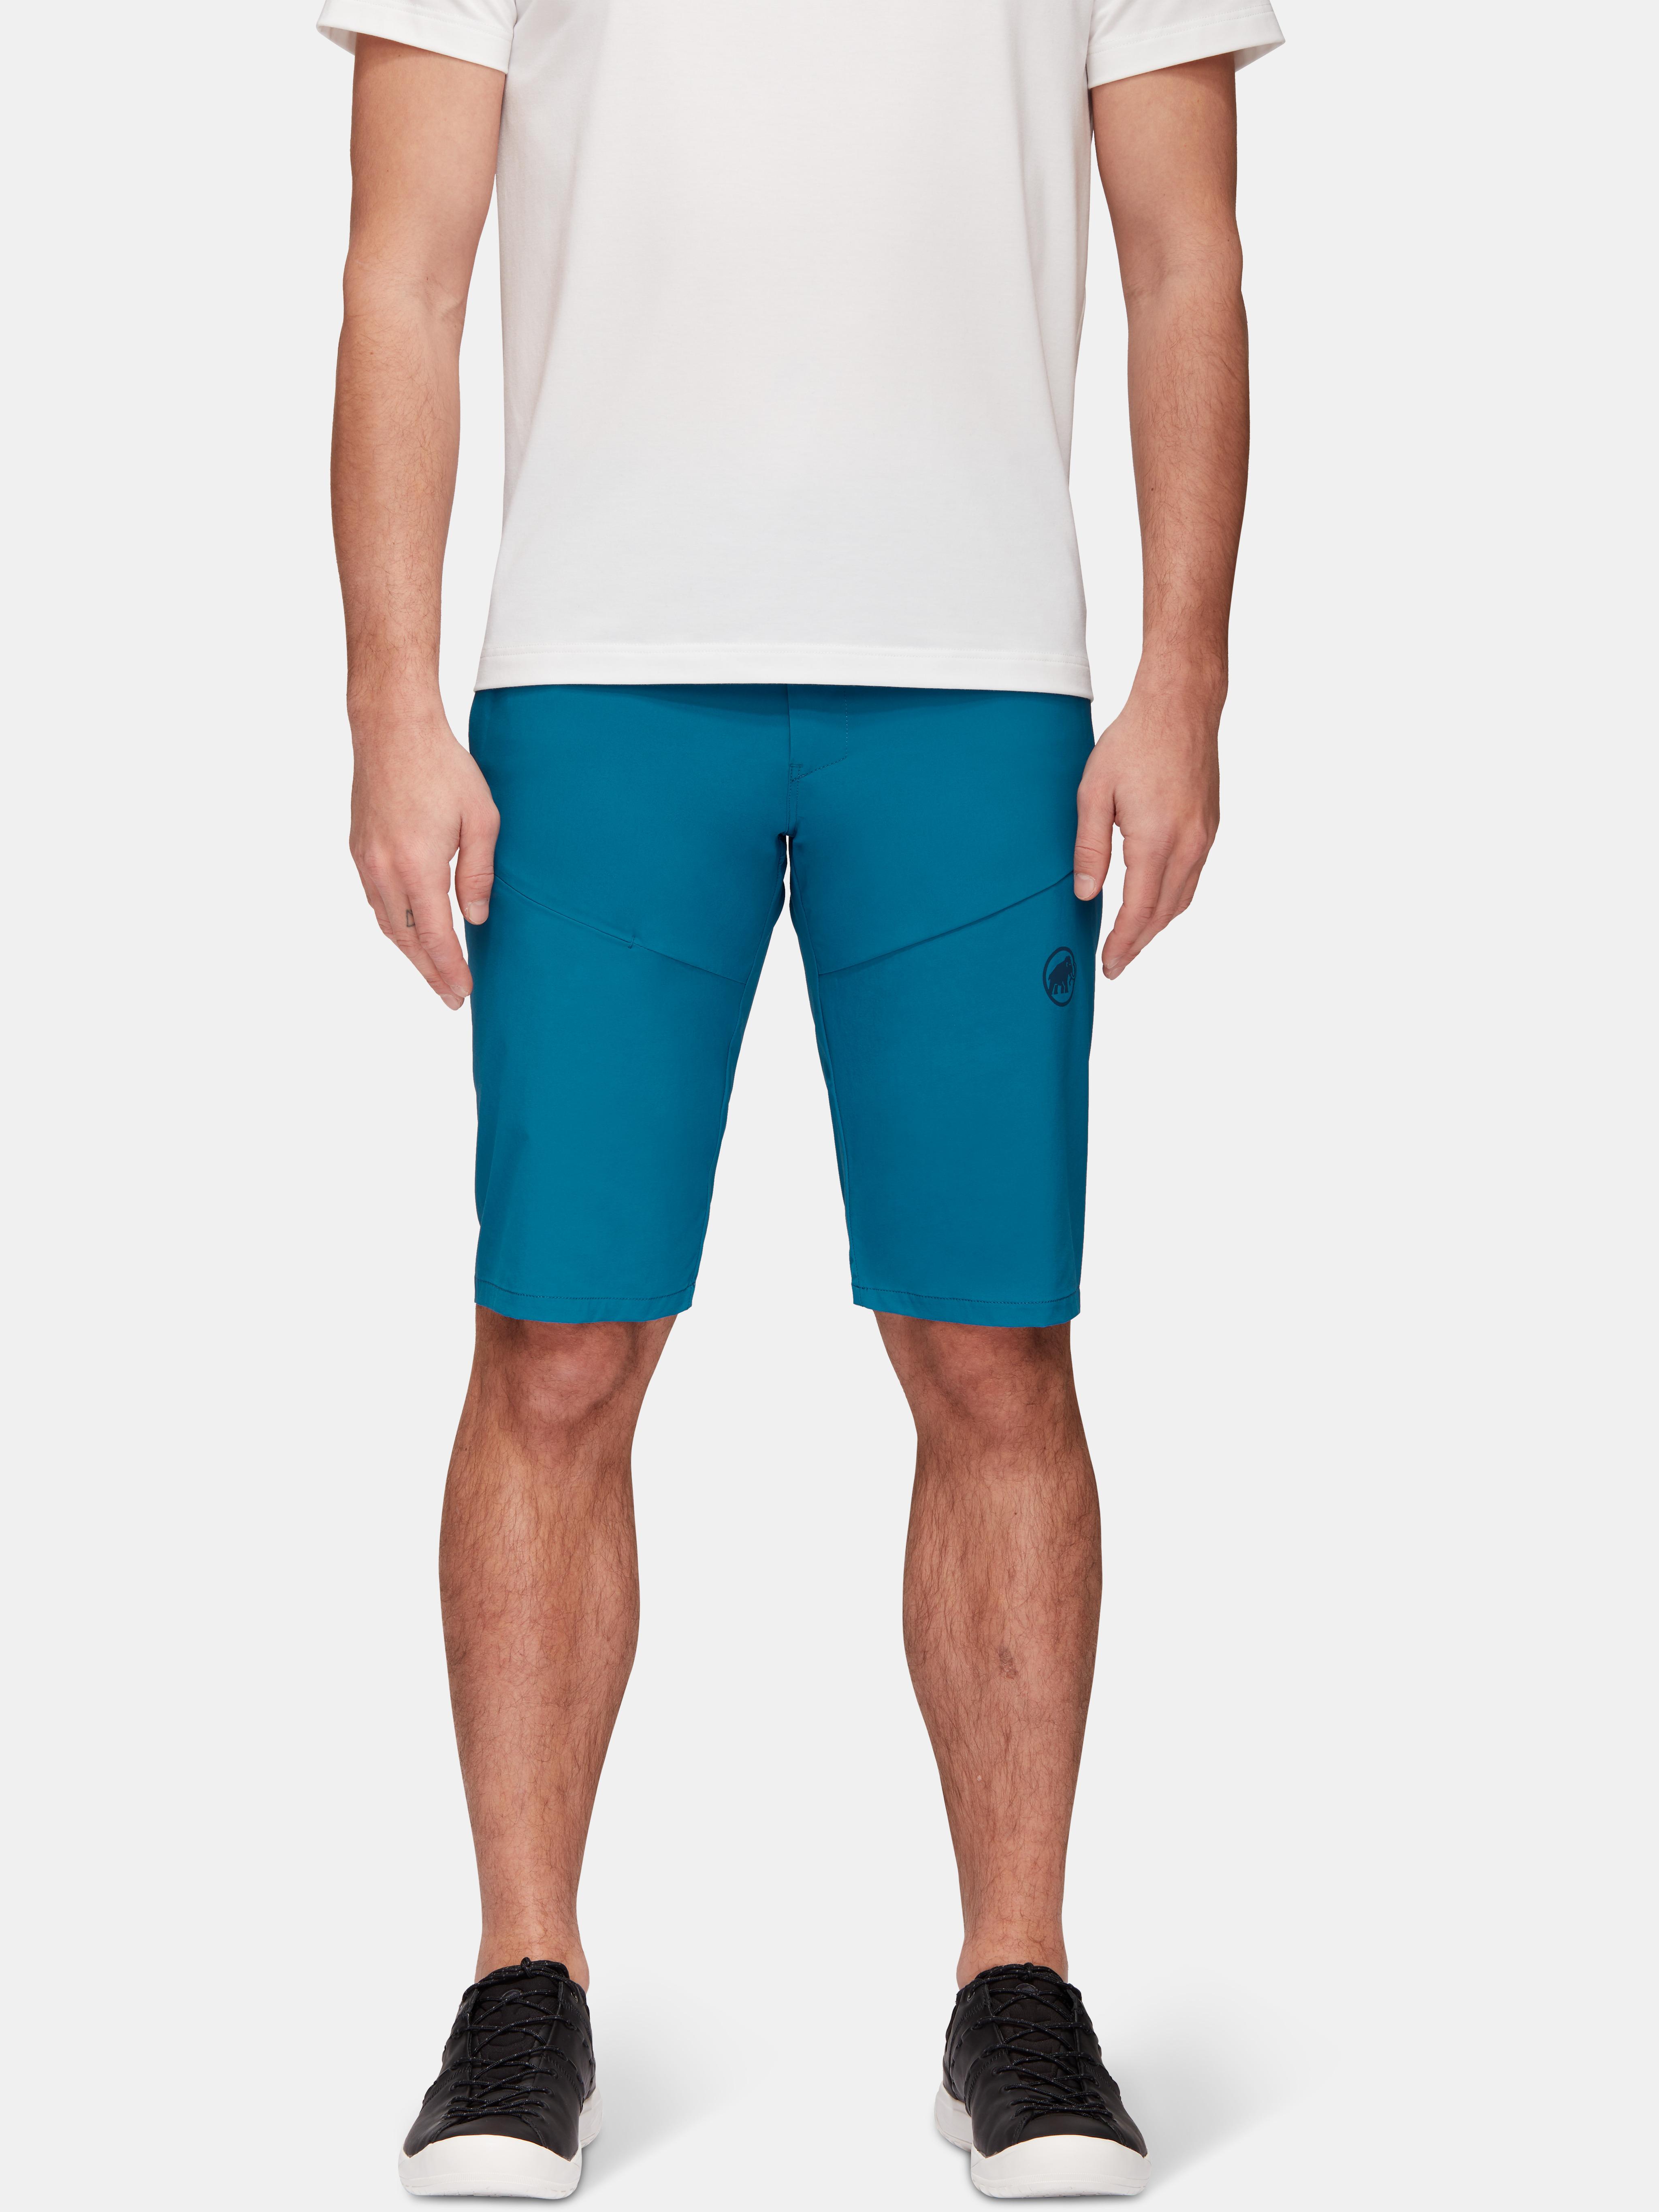 Runbold Shorts Men image